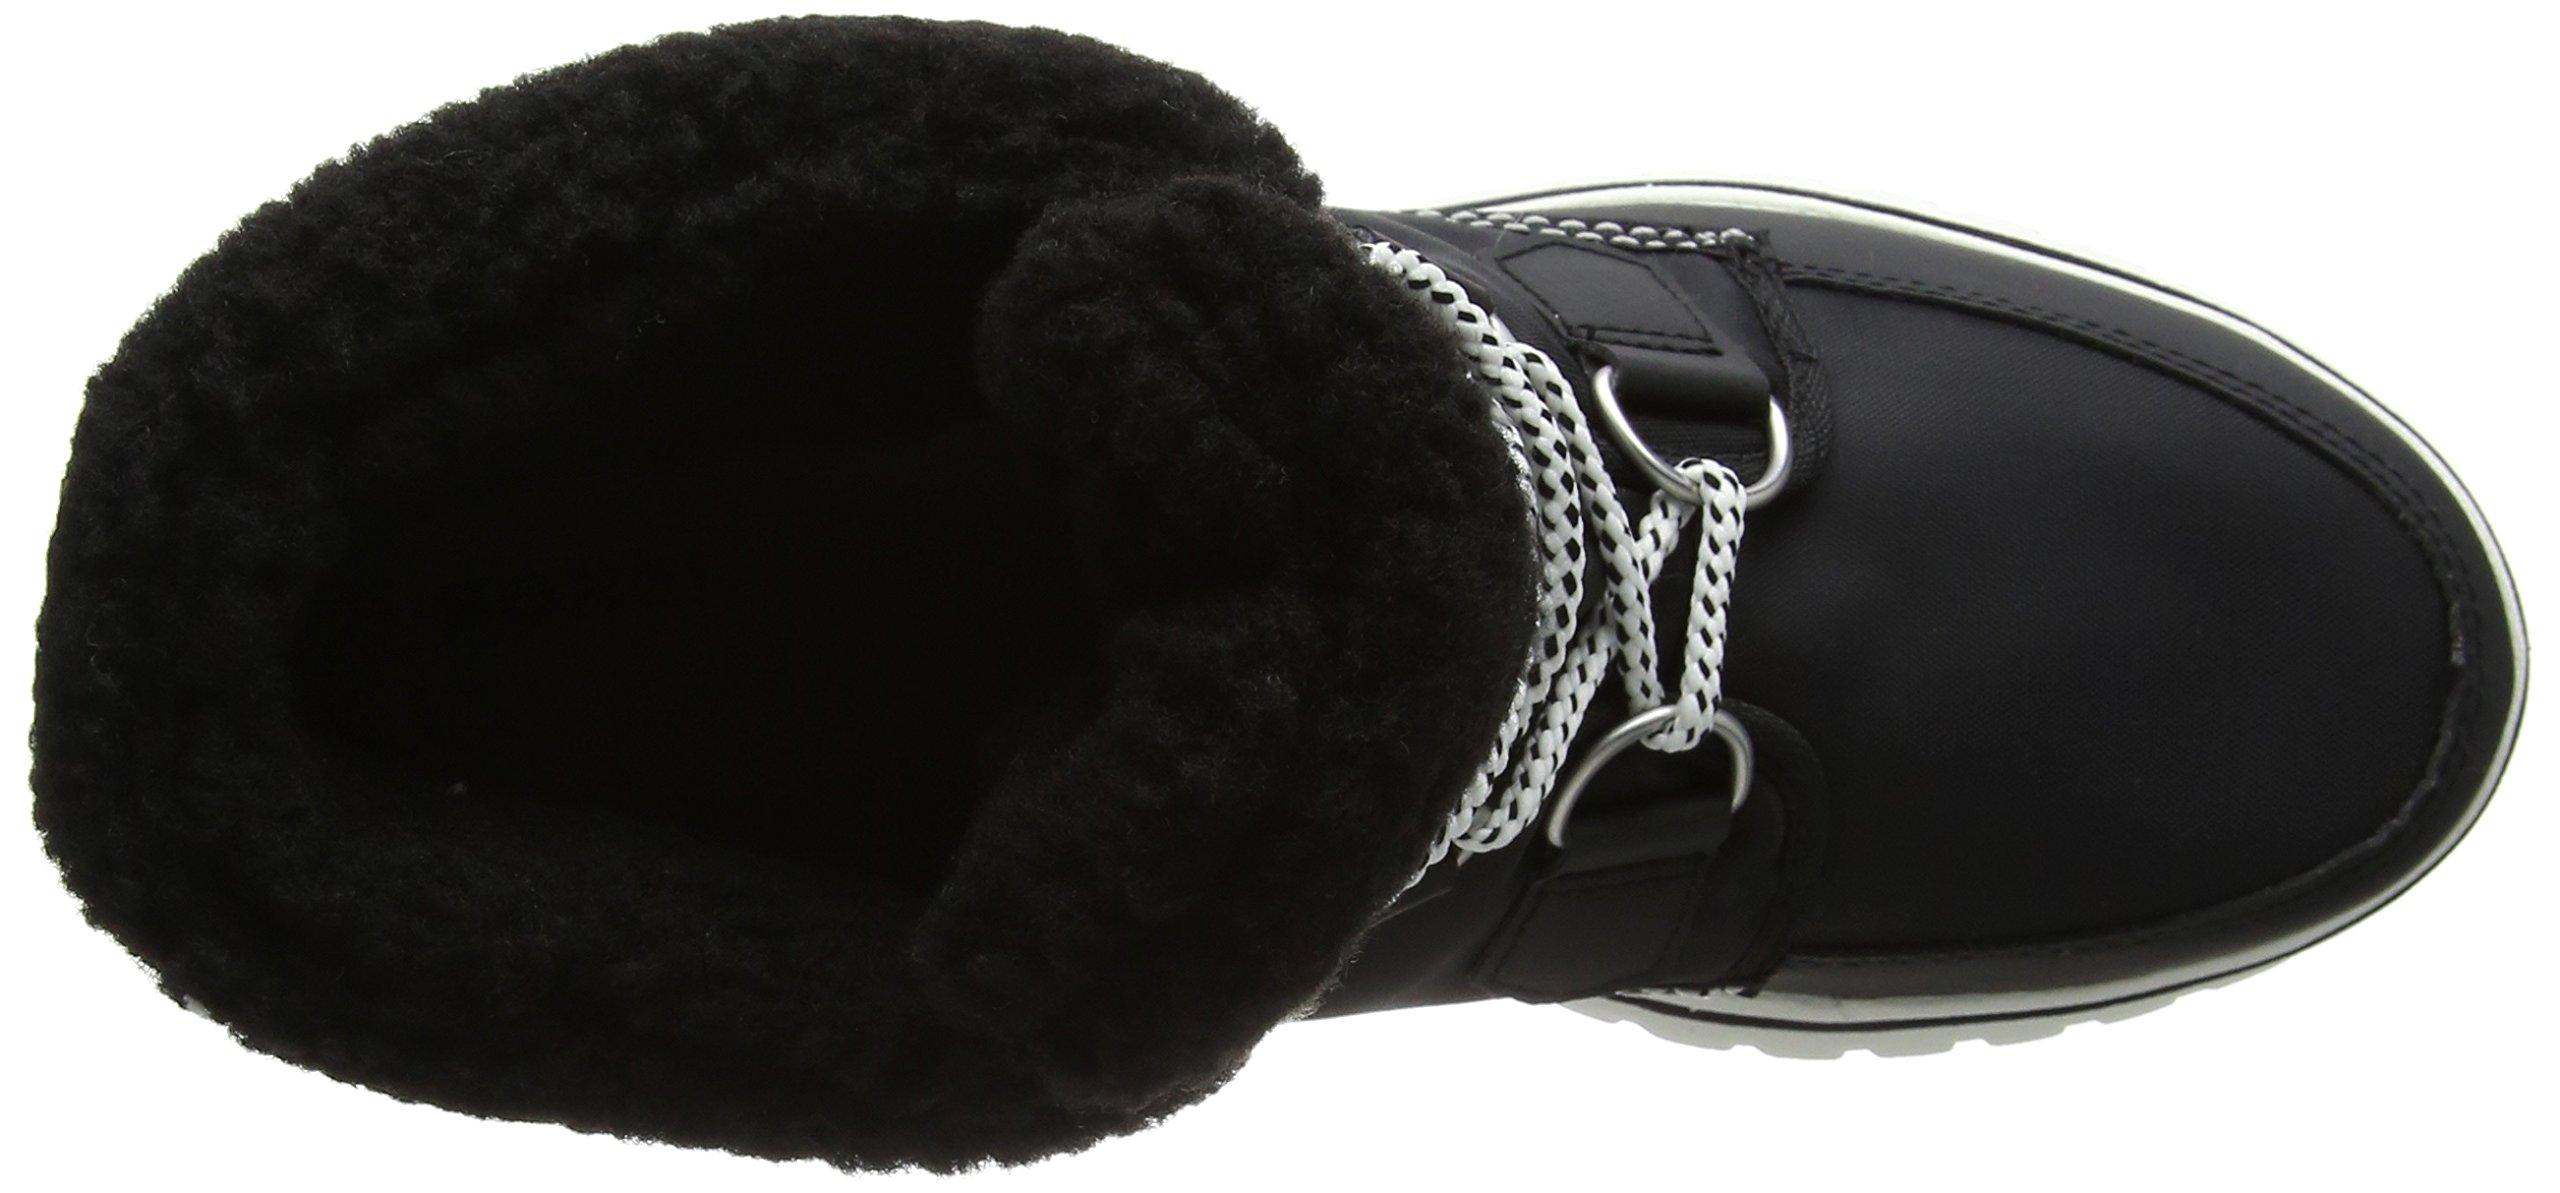 Sorel Women's Cozy Carnival Booties, Black, 7.5 B(M) US by SOREL (Image #7)